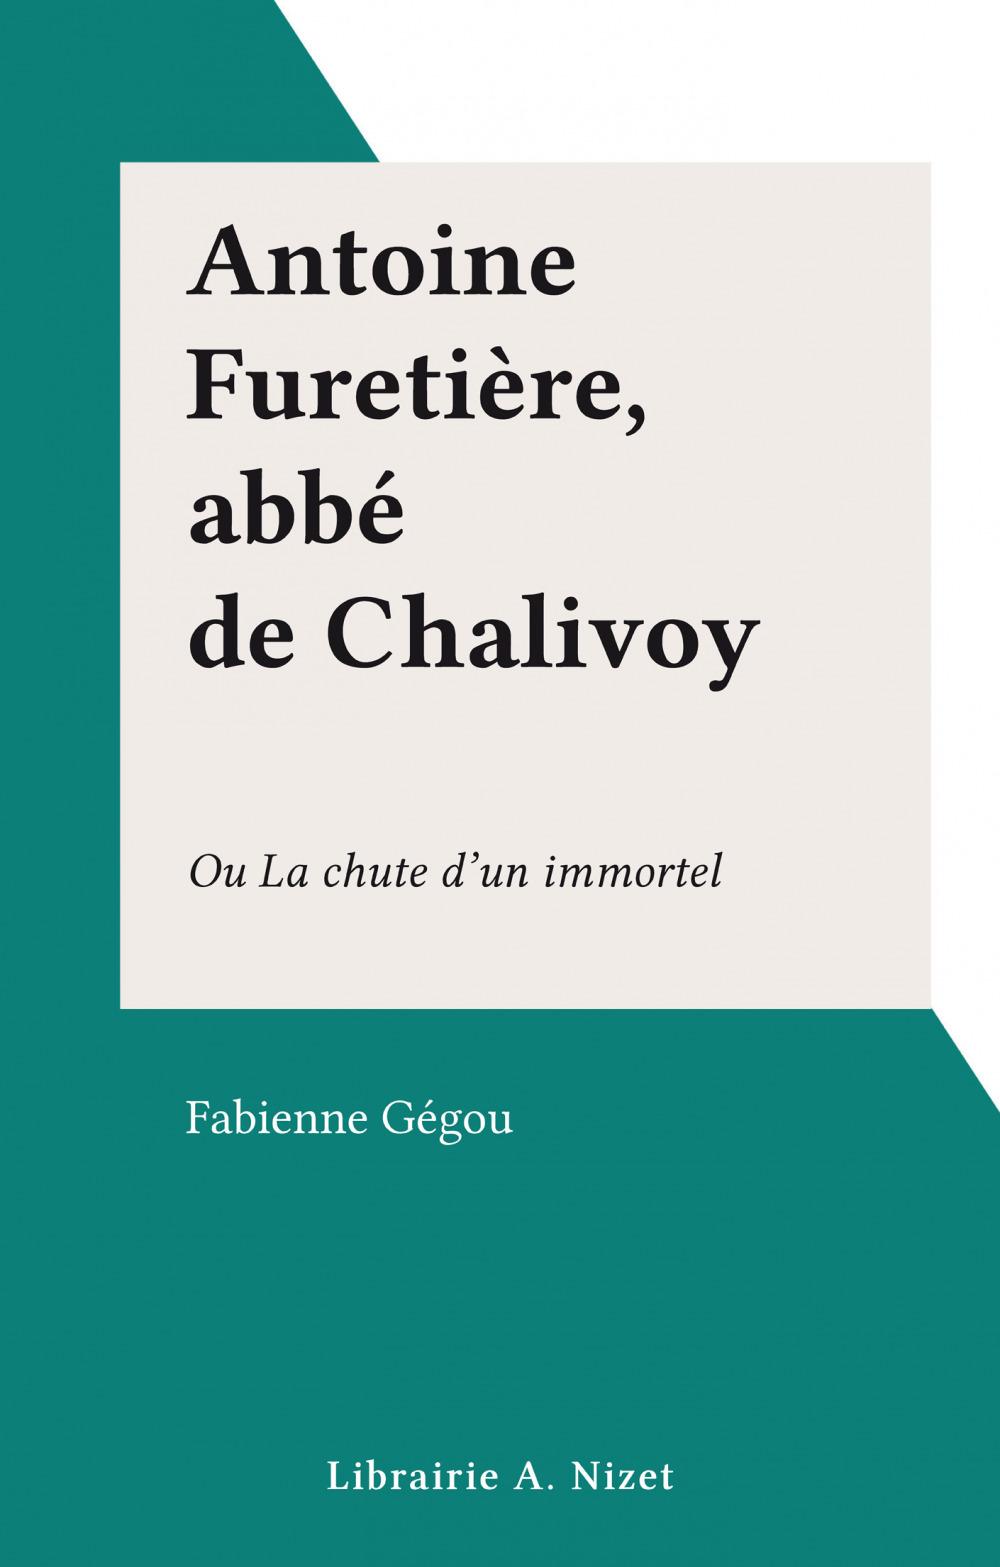 Antoine Furetière, abbé de Chalivoy